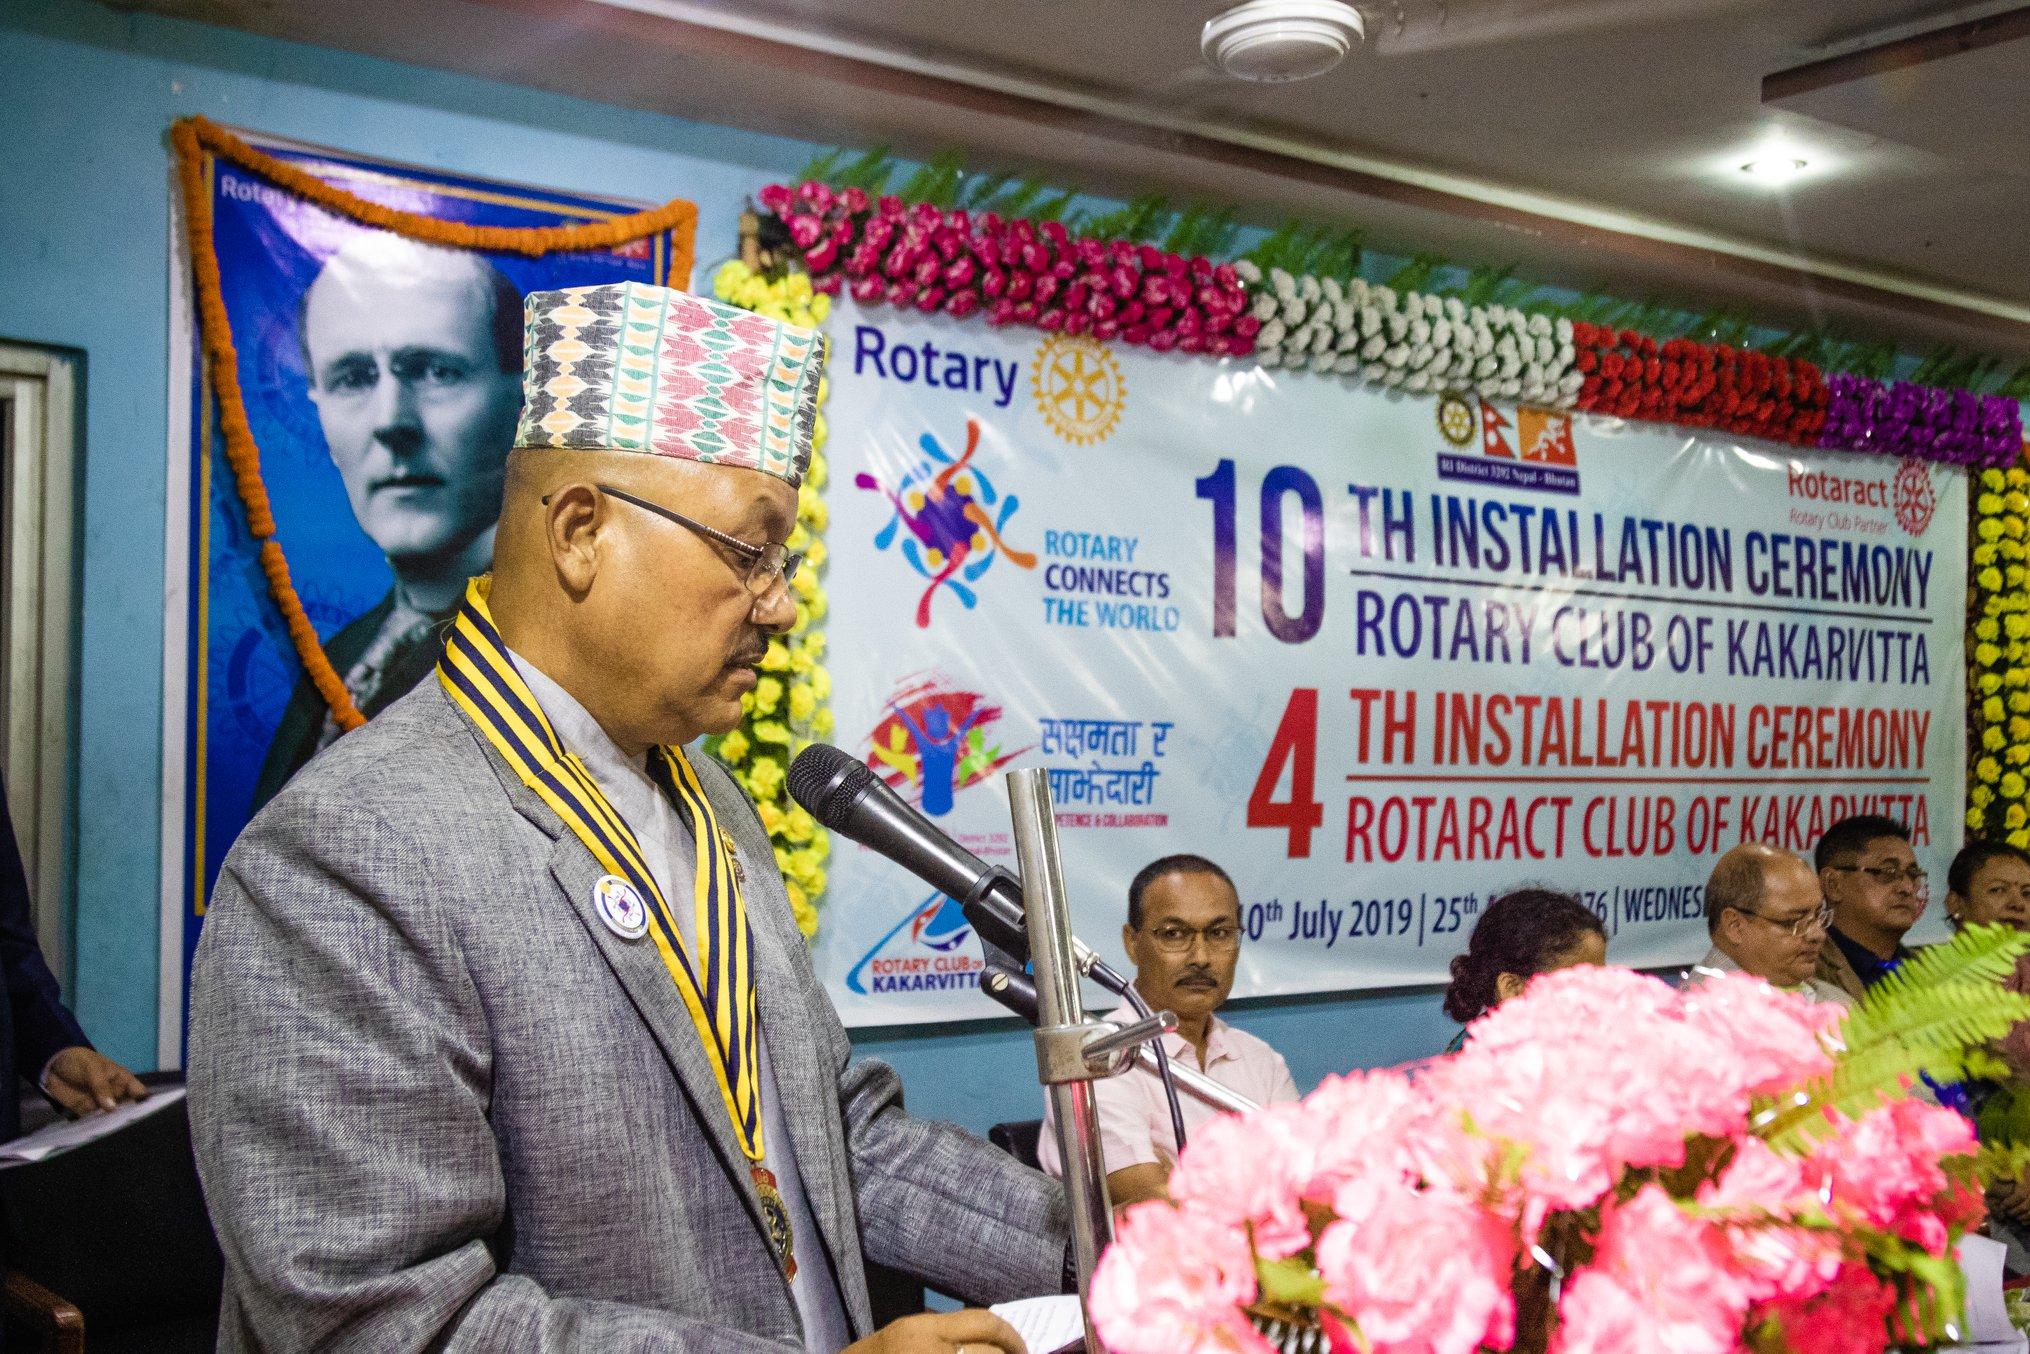 10th Installation Ceremony Rotary Club Of Kakarvitta 13